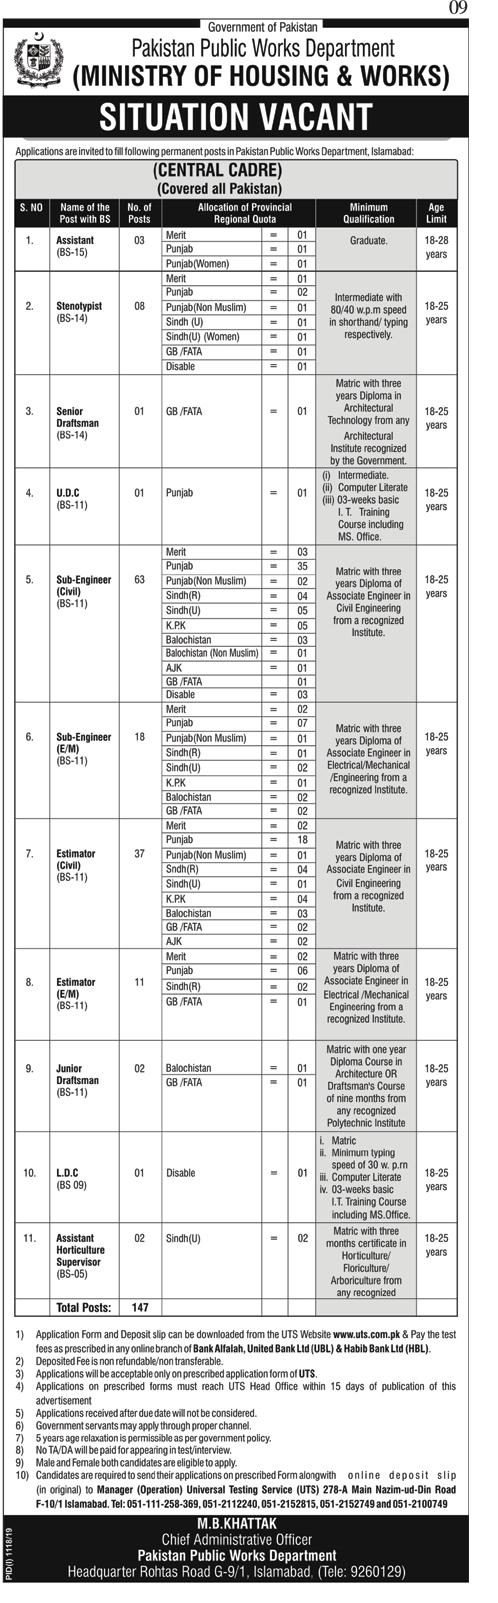 Pakistan Public Works Department PWD Jobs UTS Test Roll No Slip